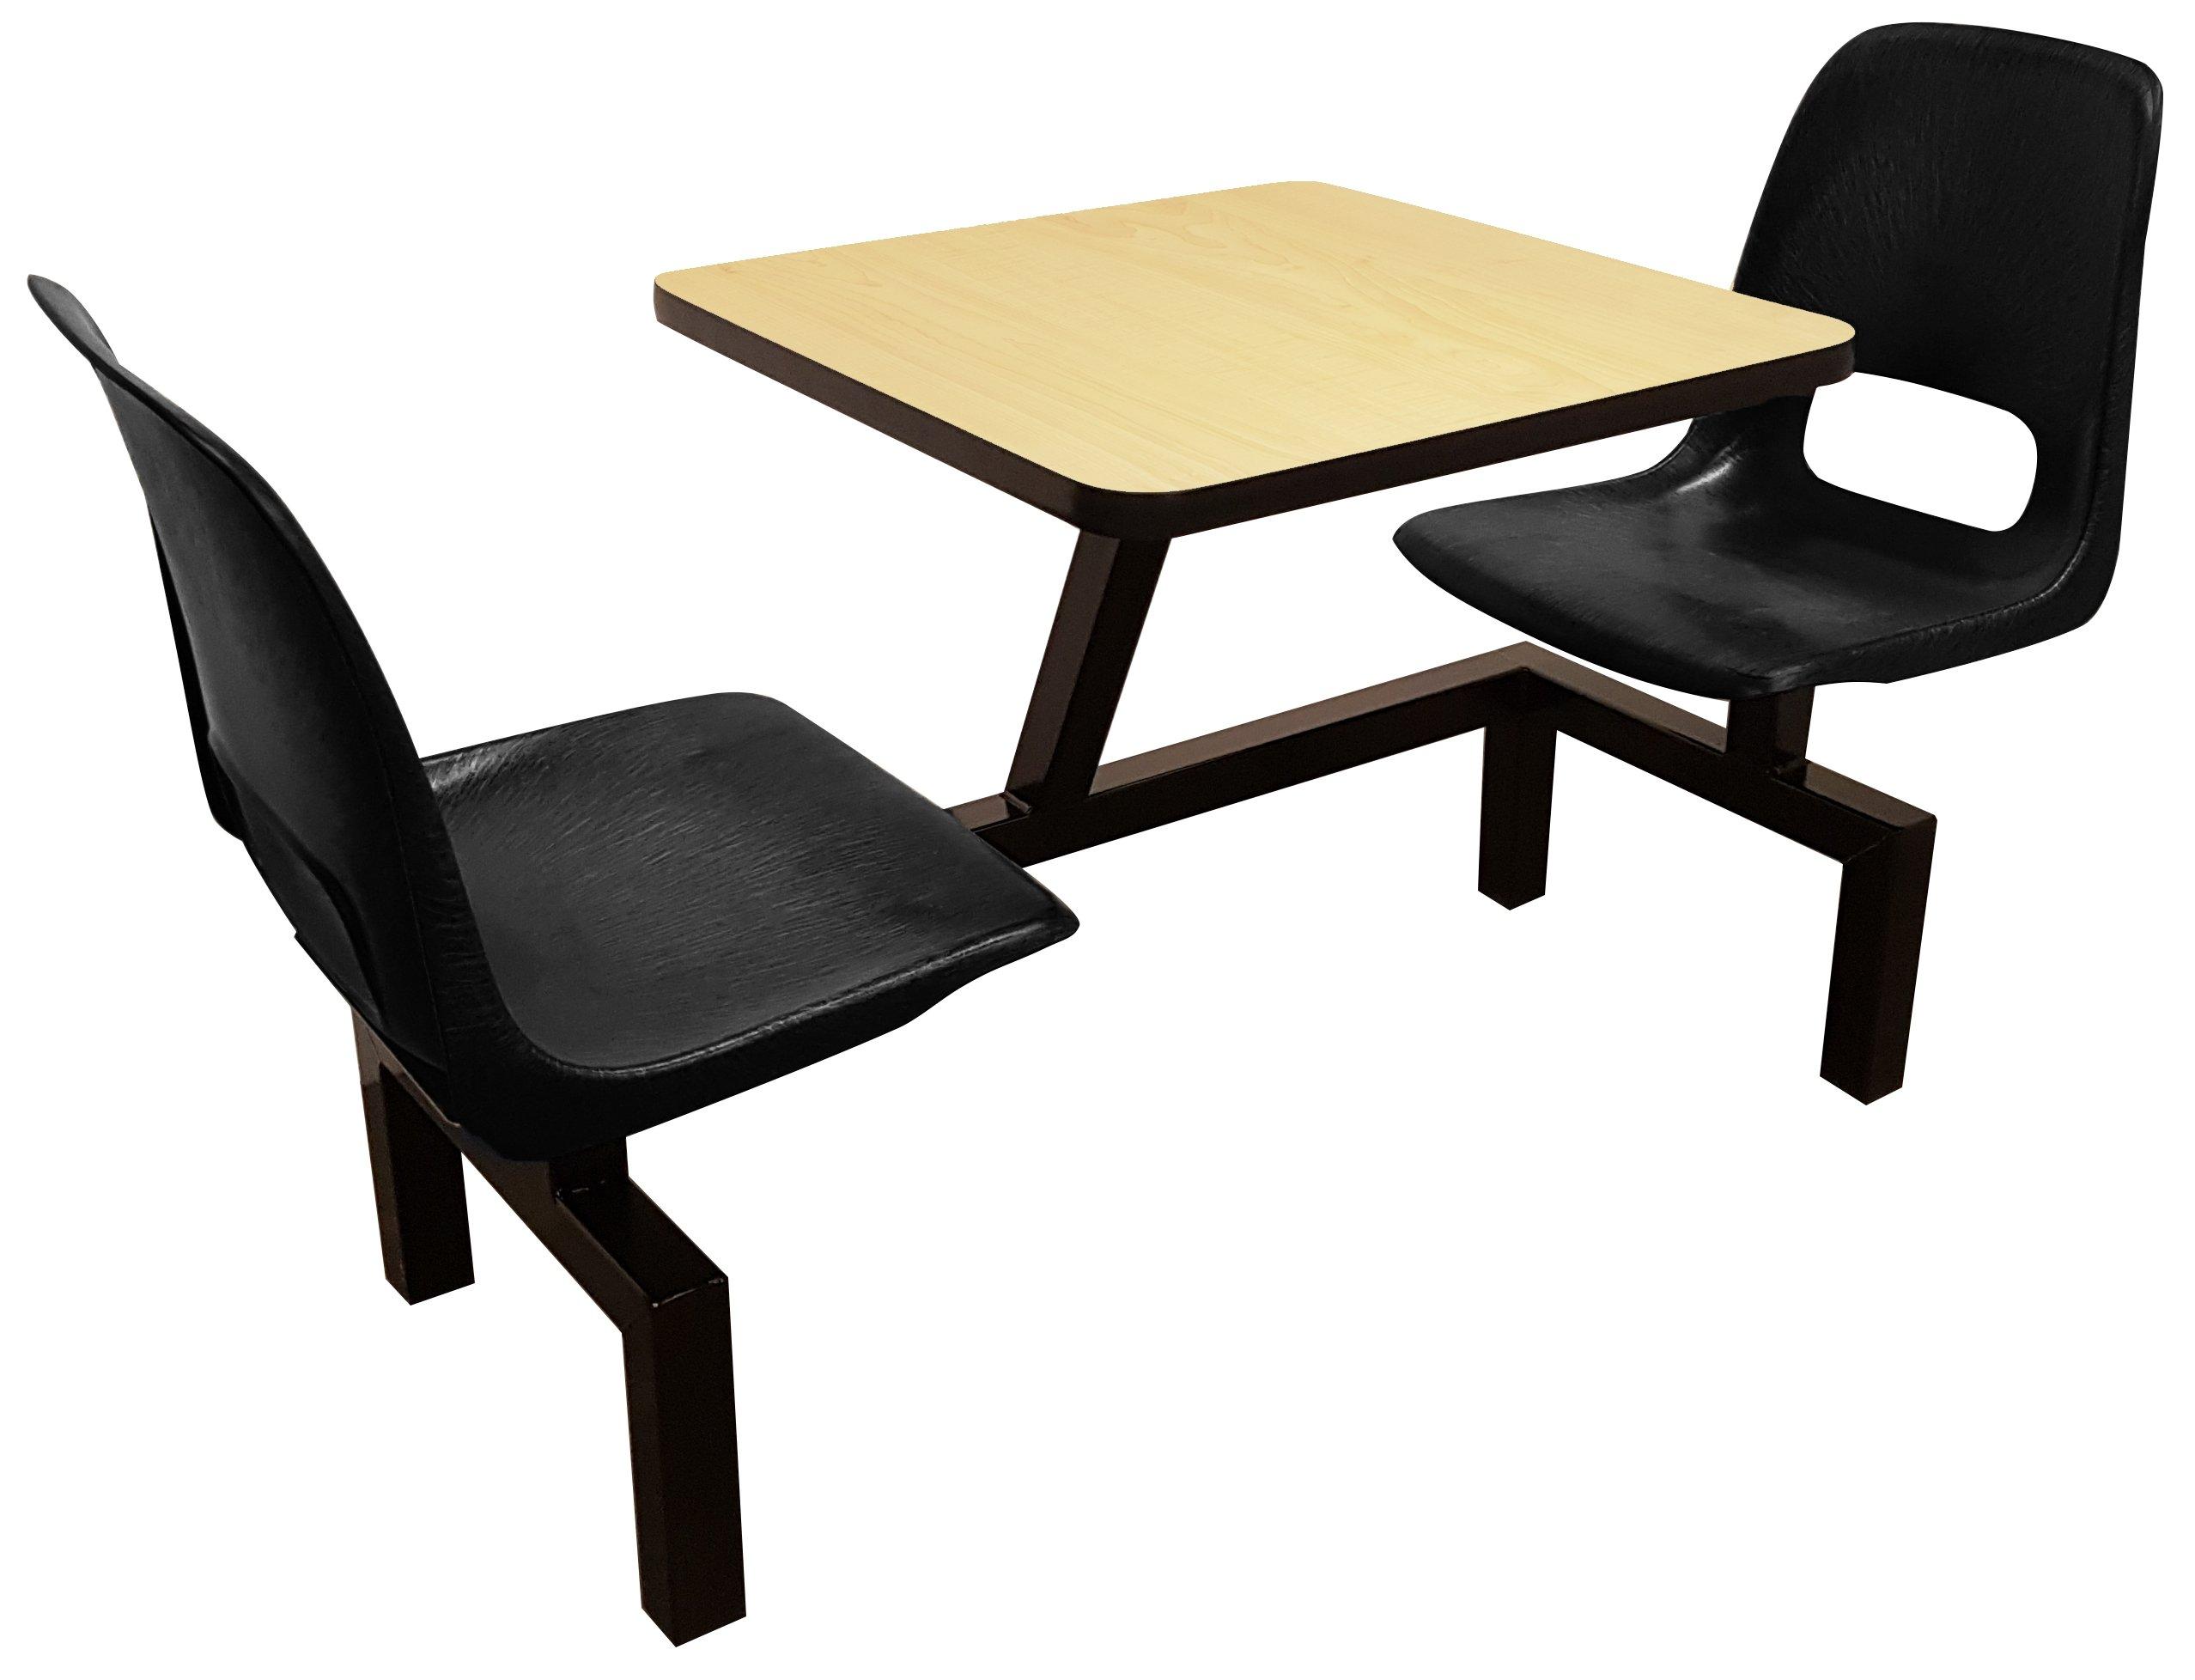 Rodo Industries 12STW-BK-FM 12STW,BK,FM Series 1 Public Cluster Modular Seating, Two Seat Wall Units, Black Seat, Fusion Maple Tabletop, 60'' x 24'' x 29''